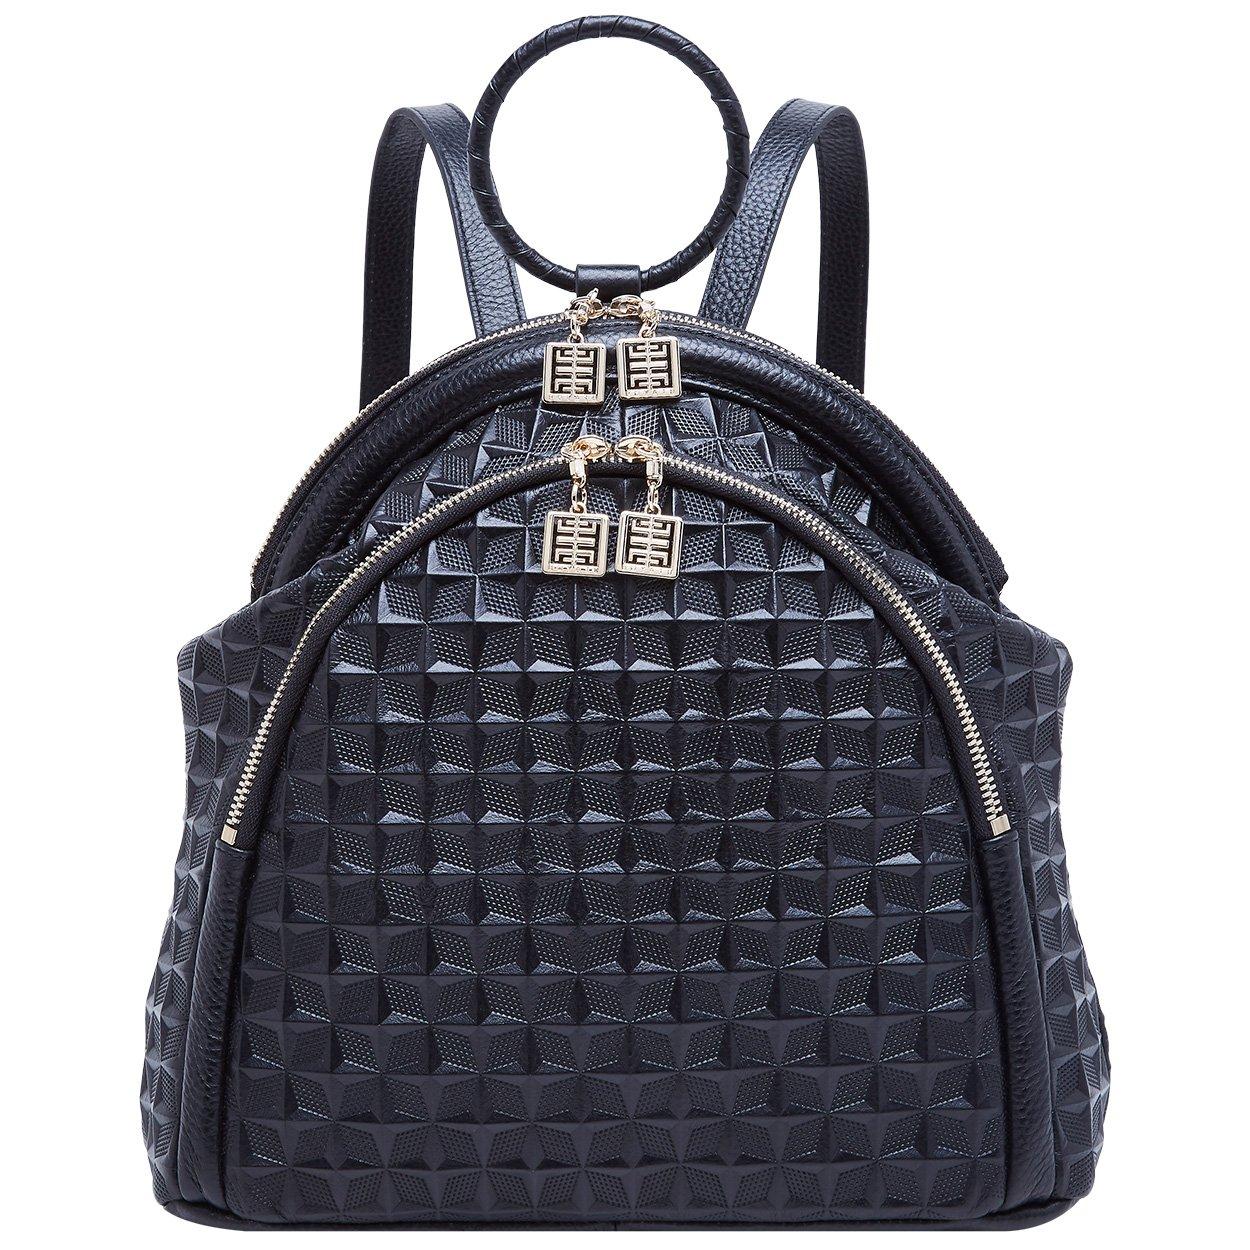 92bff32948 Amazon.com  BOYATU Genuine Leather Backpack for Women Elegant Ring Top  Handle Fashion Bag (Black-1)  Shoes